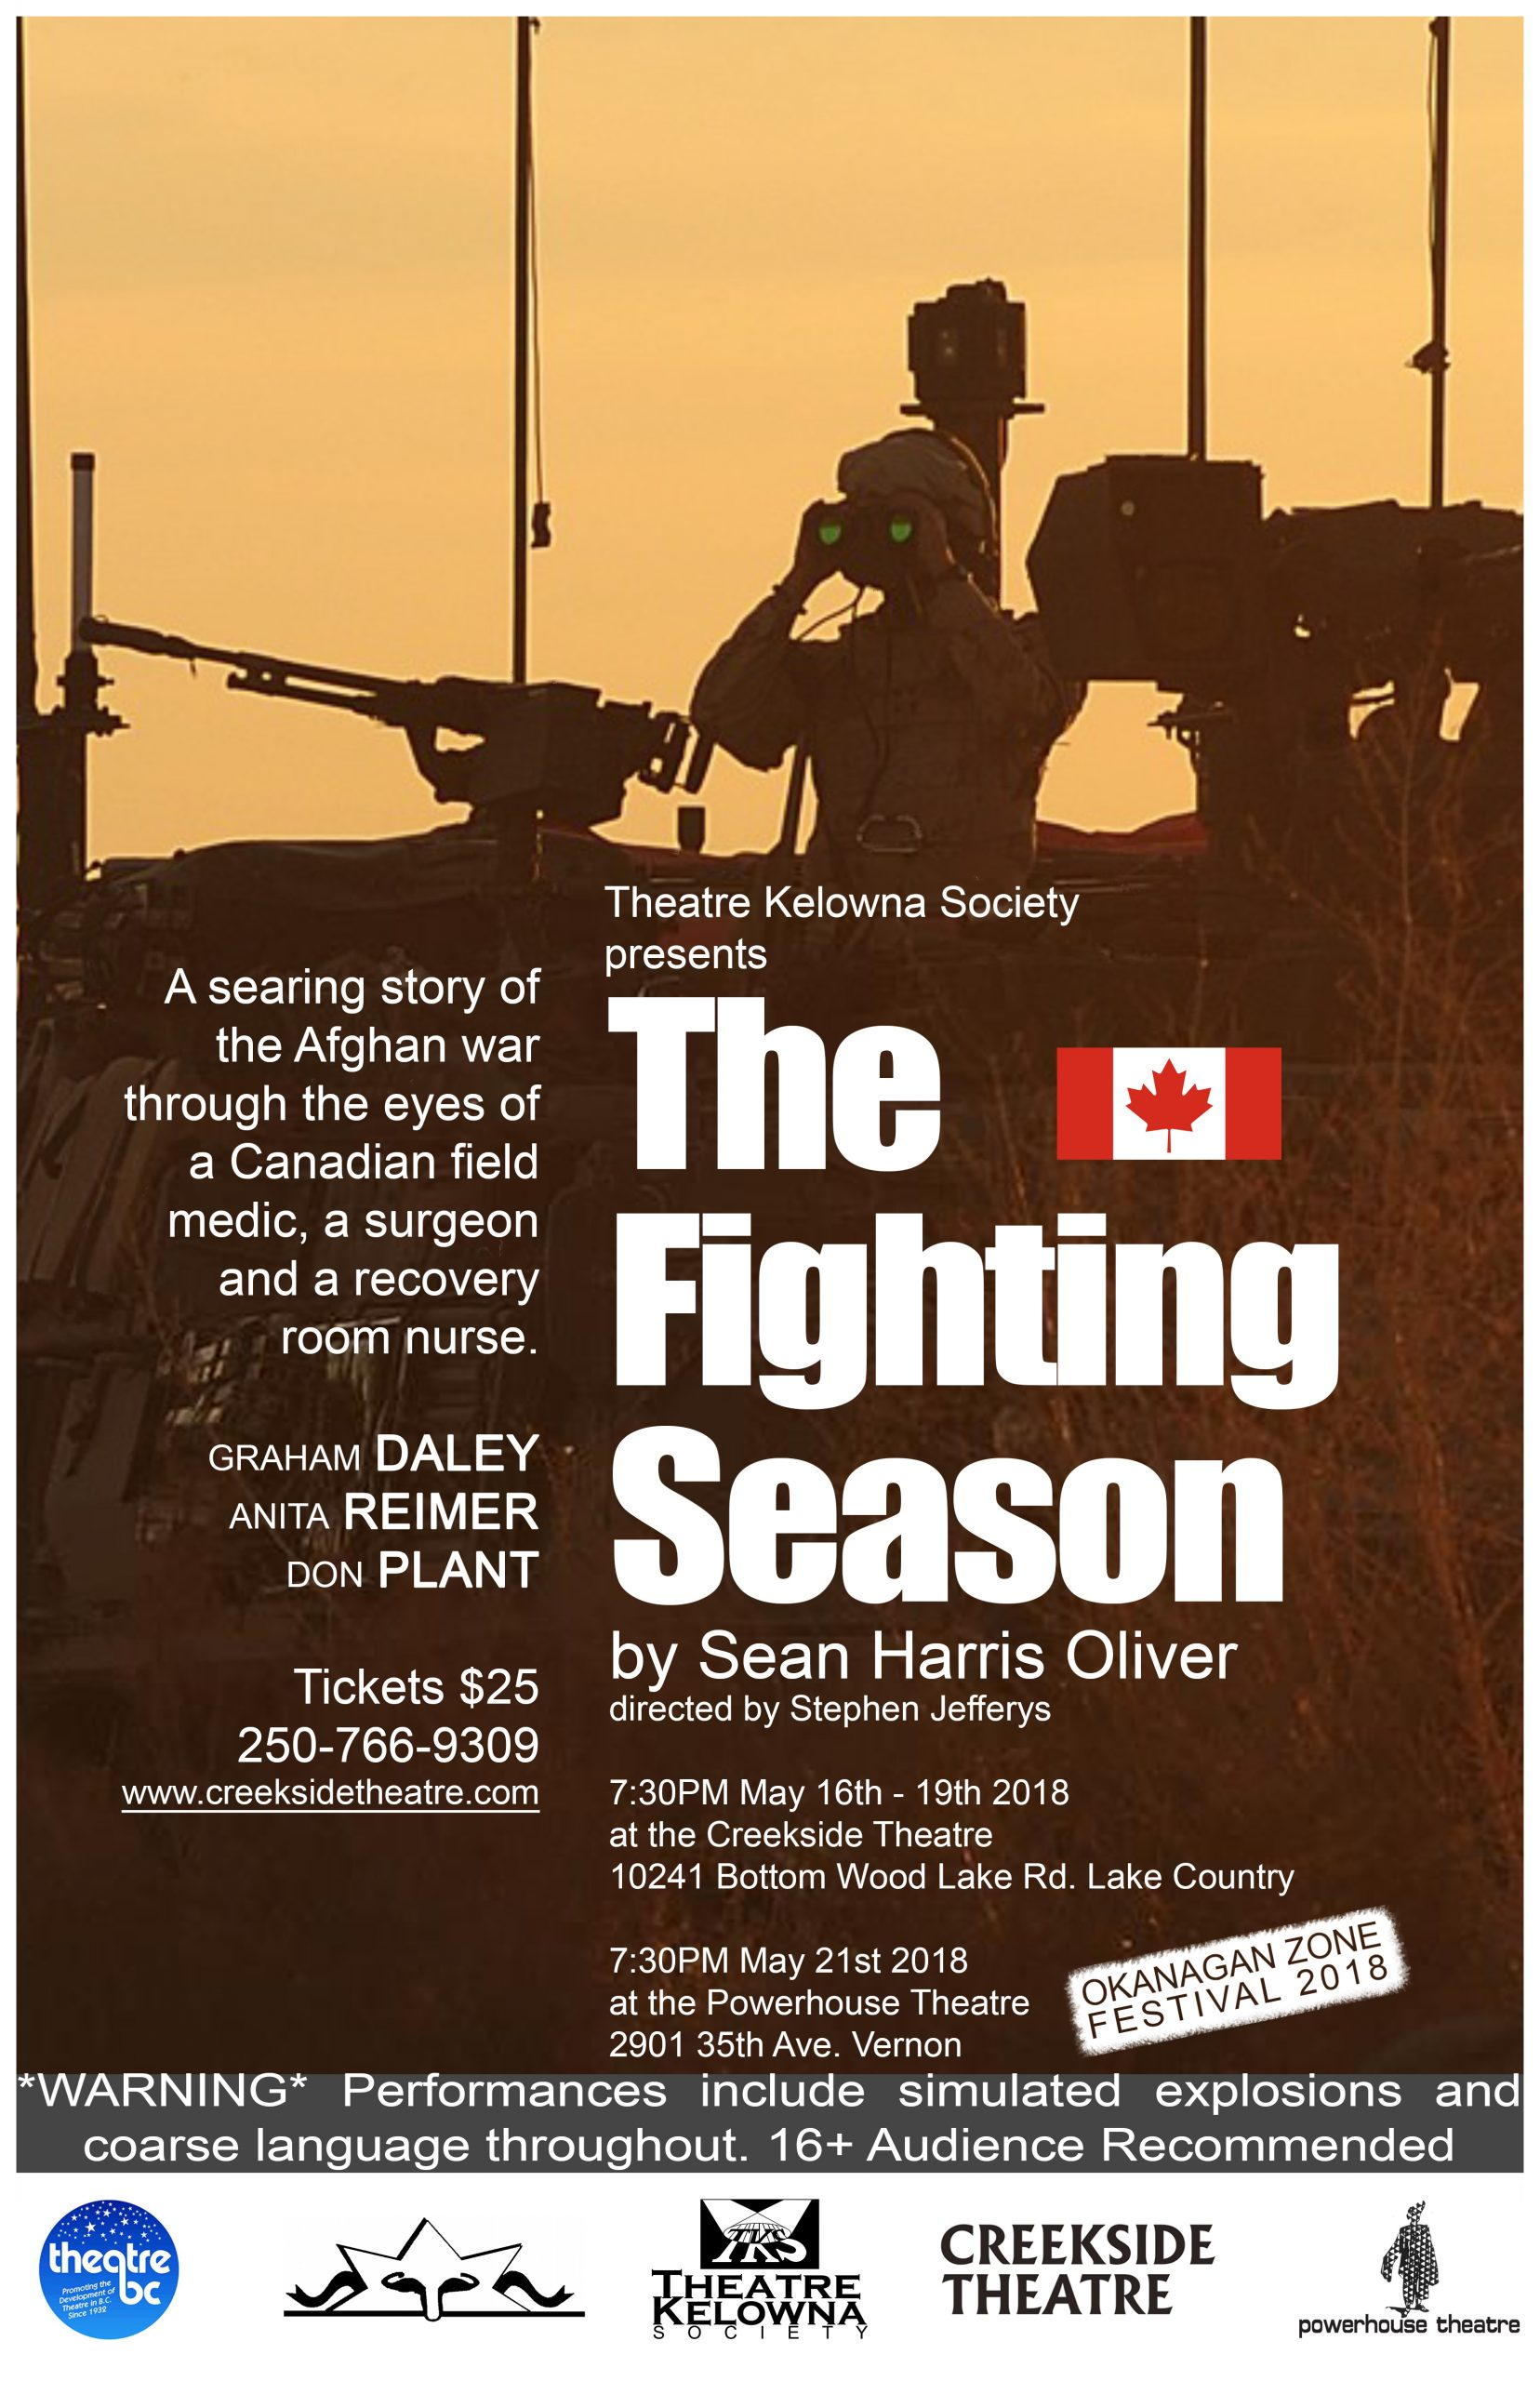 Theatre Kelowna presents The Fighting Season